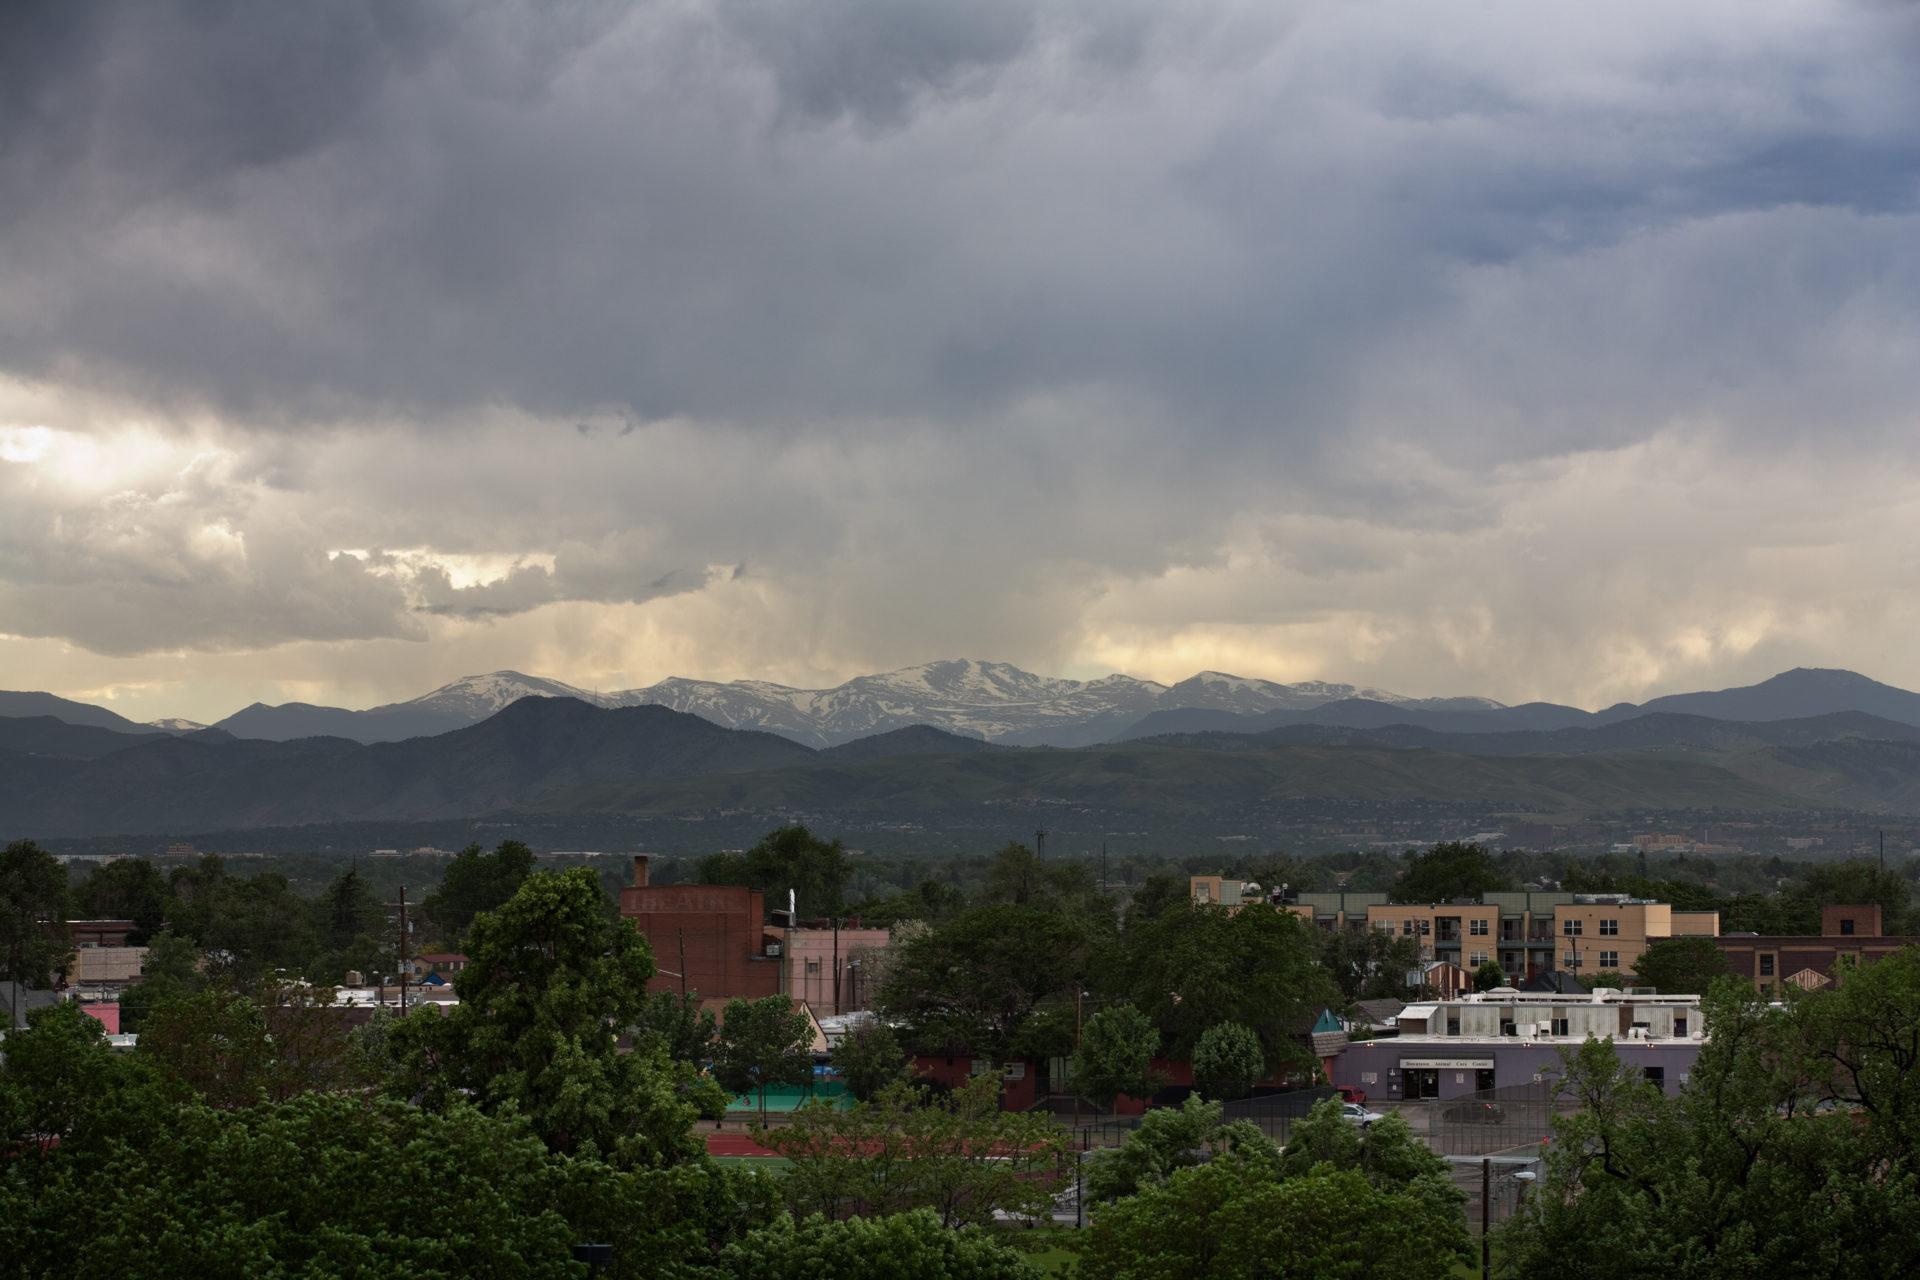 Mount Evans sunset - June 8, 2011